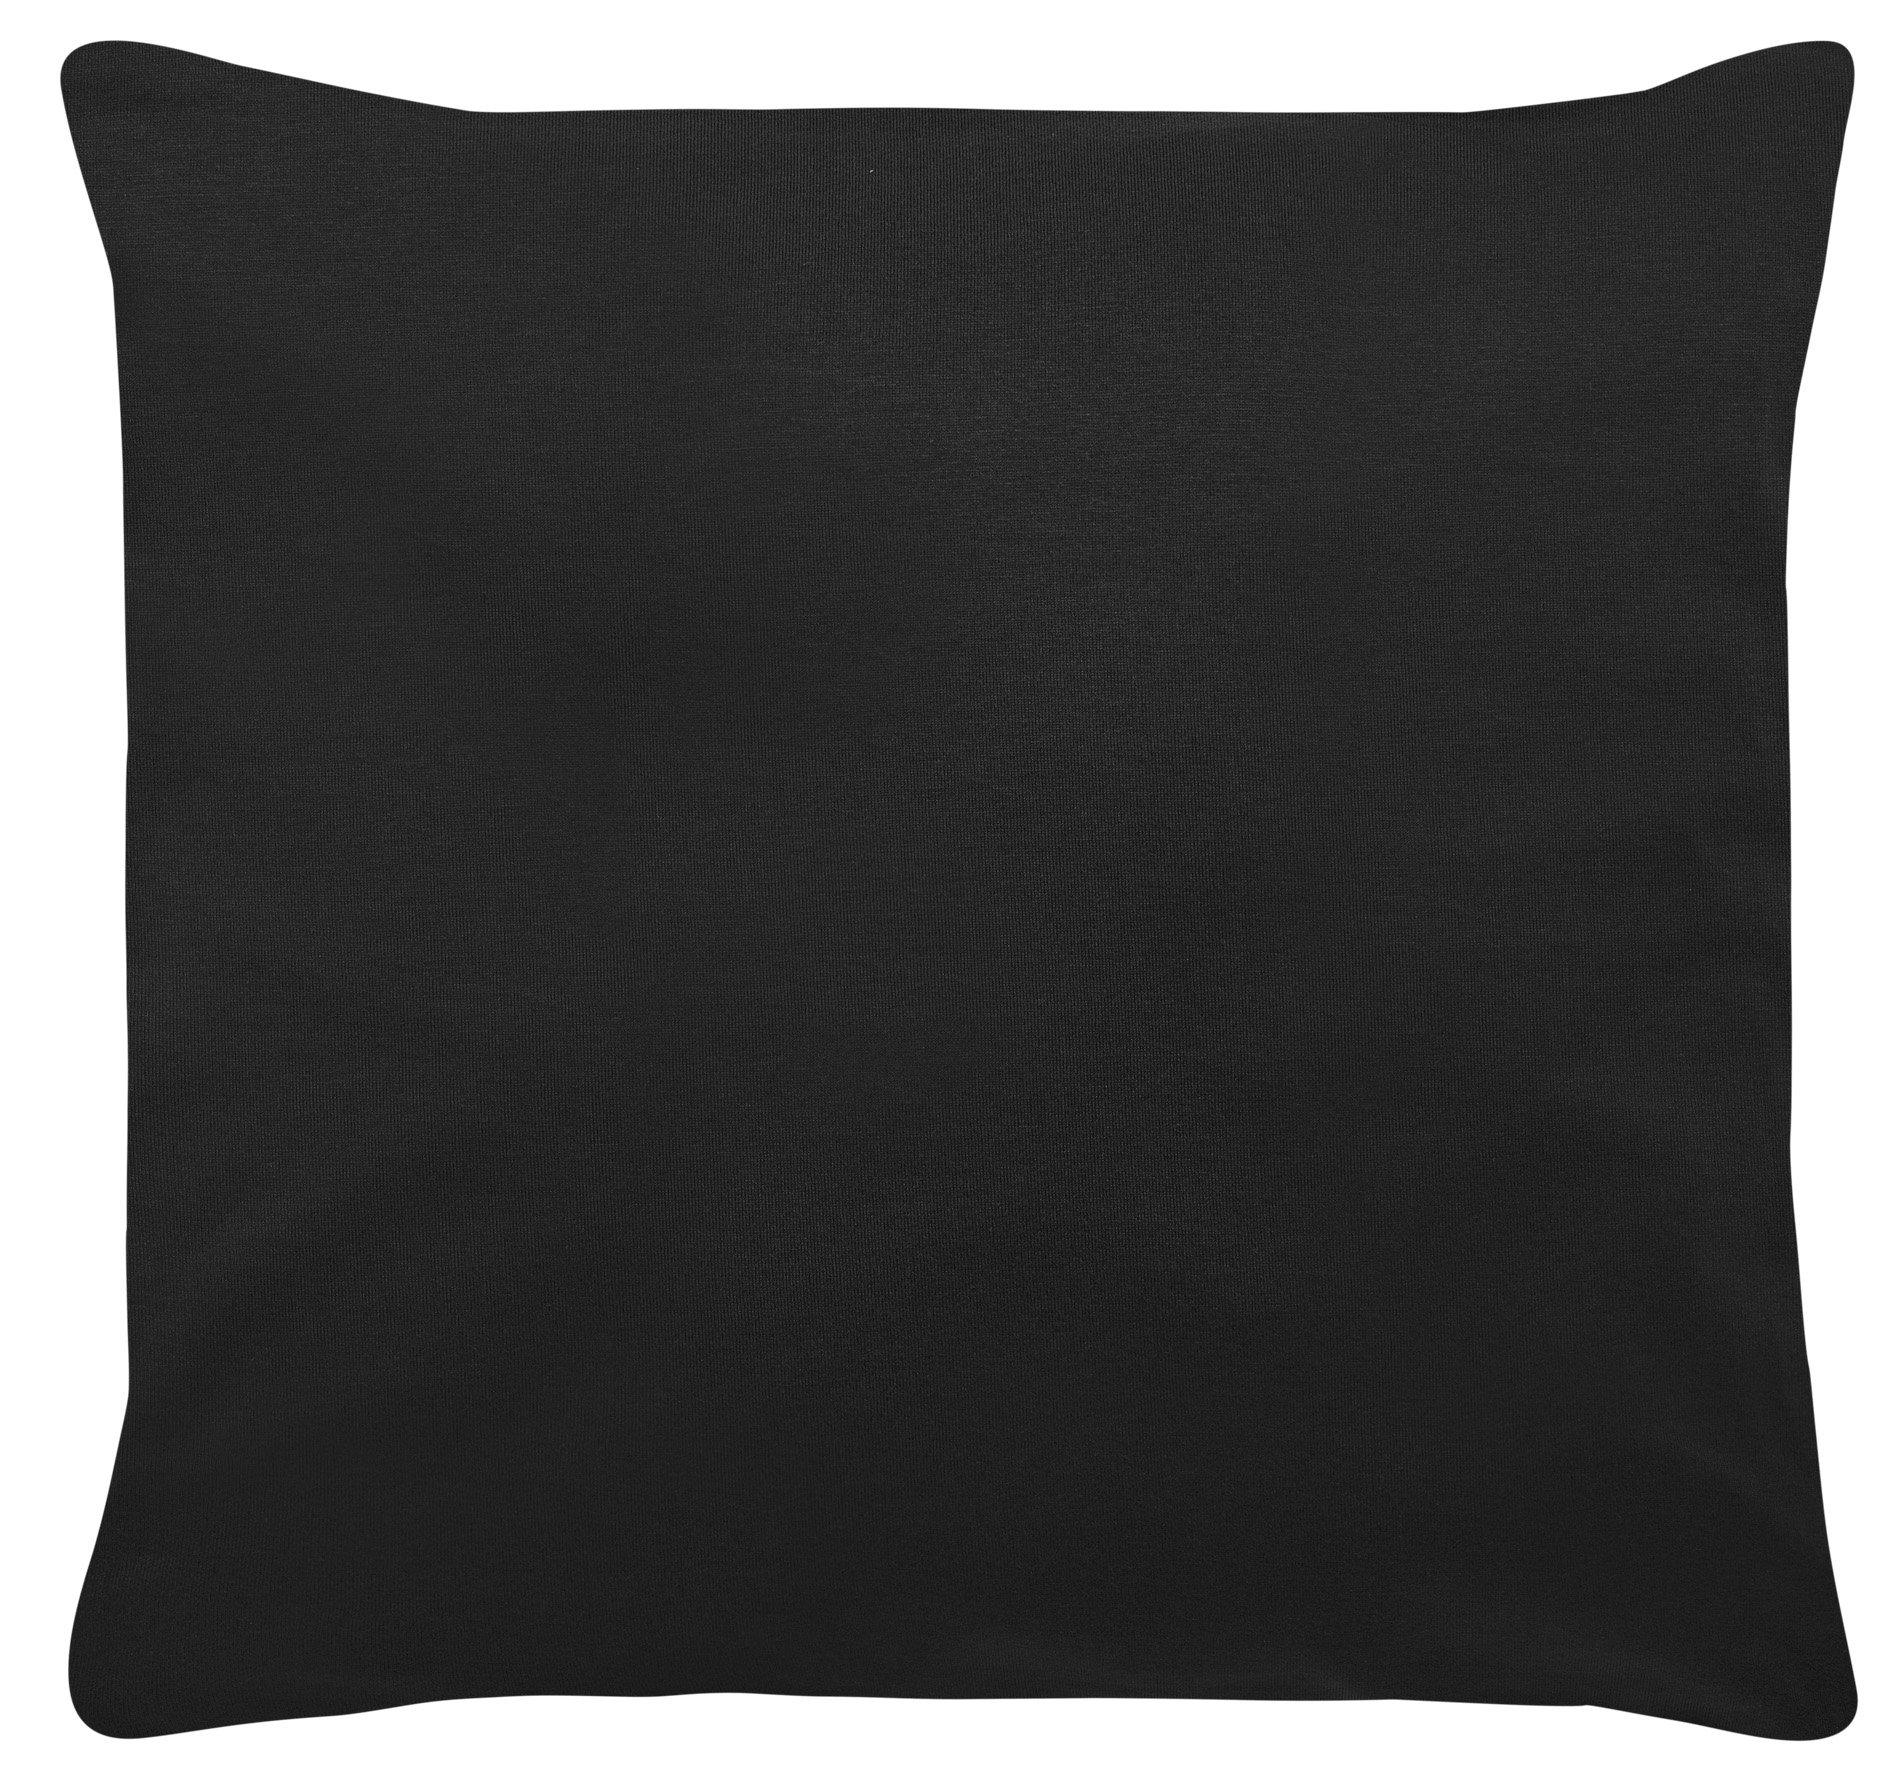 Edel-Zwirn-Jersey schwarz B40cm